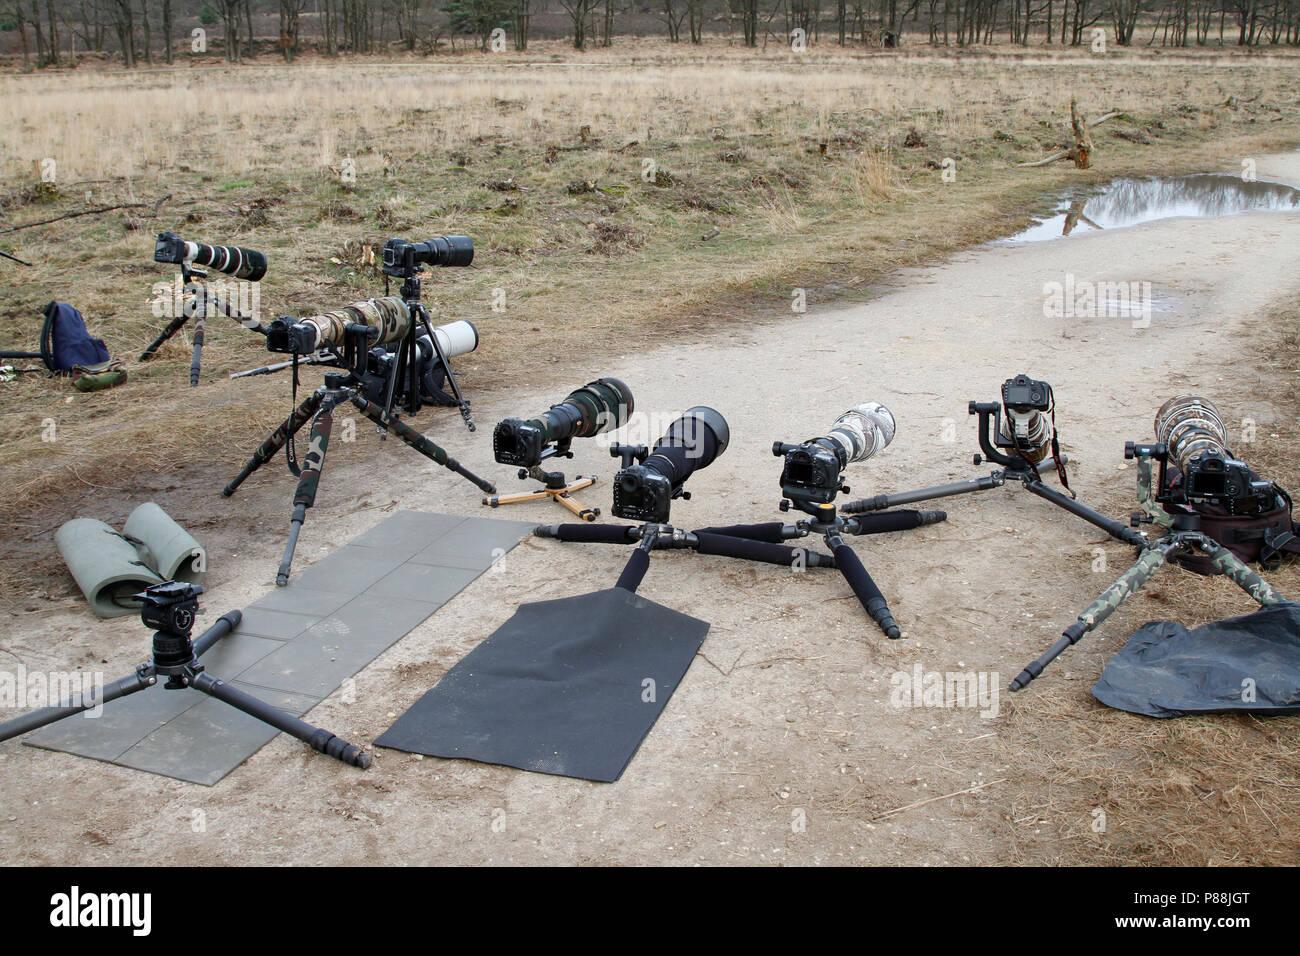 camera's, telelenzen en statieven; cameras, telephoto lenses and tripods - Stock Image